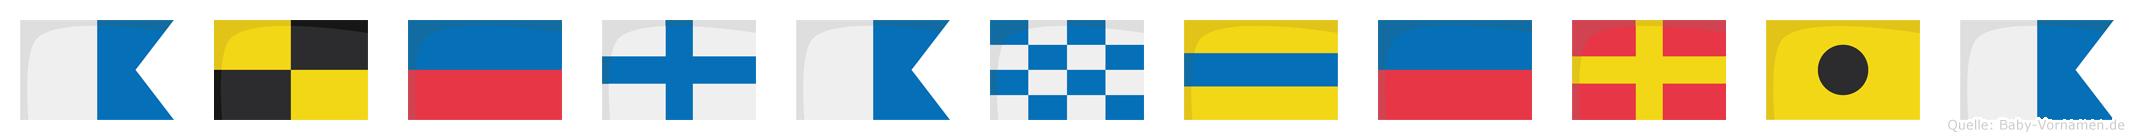 Alexanderia im Flaggenalphabet